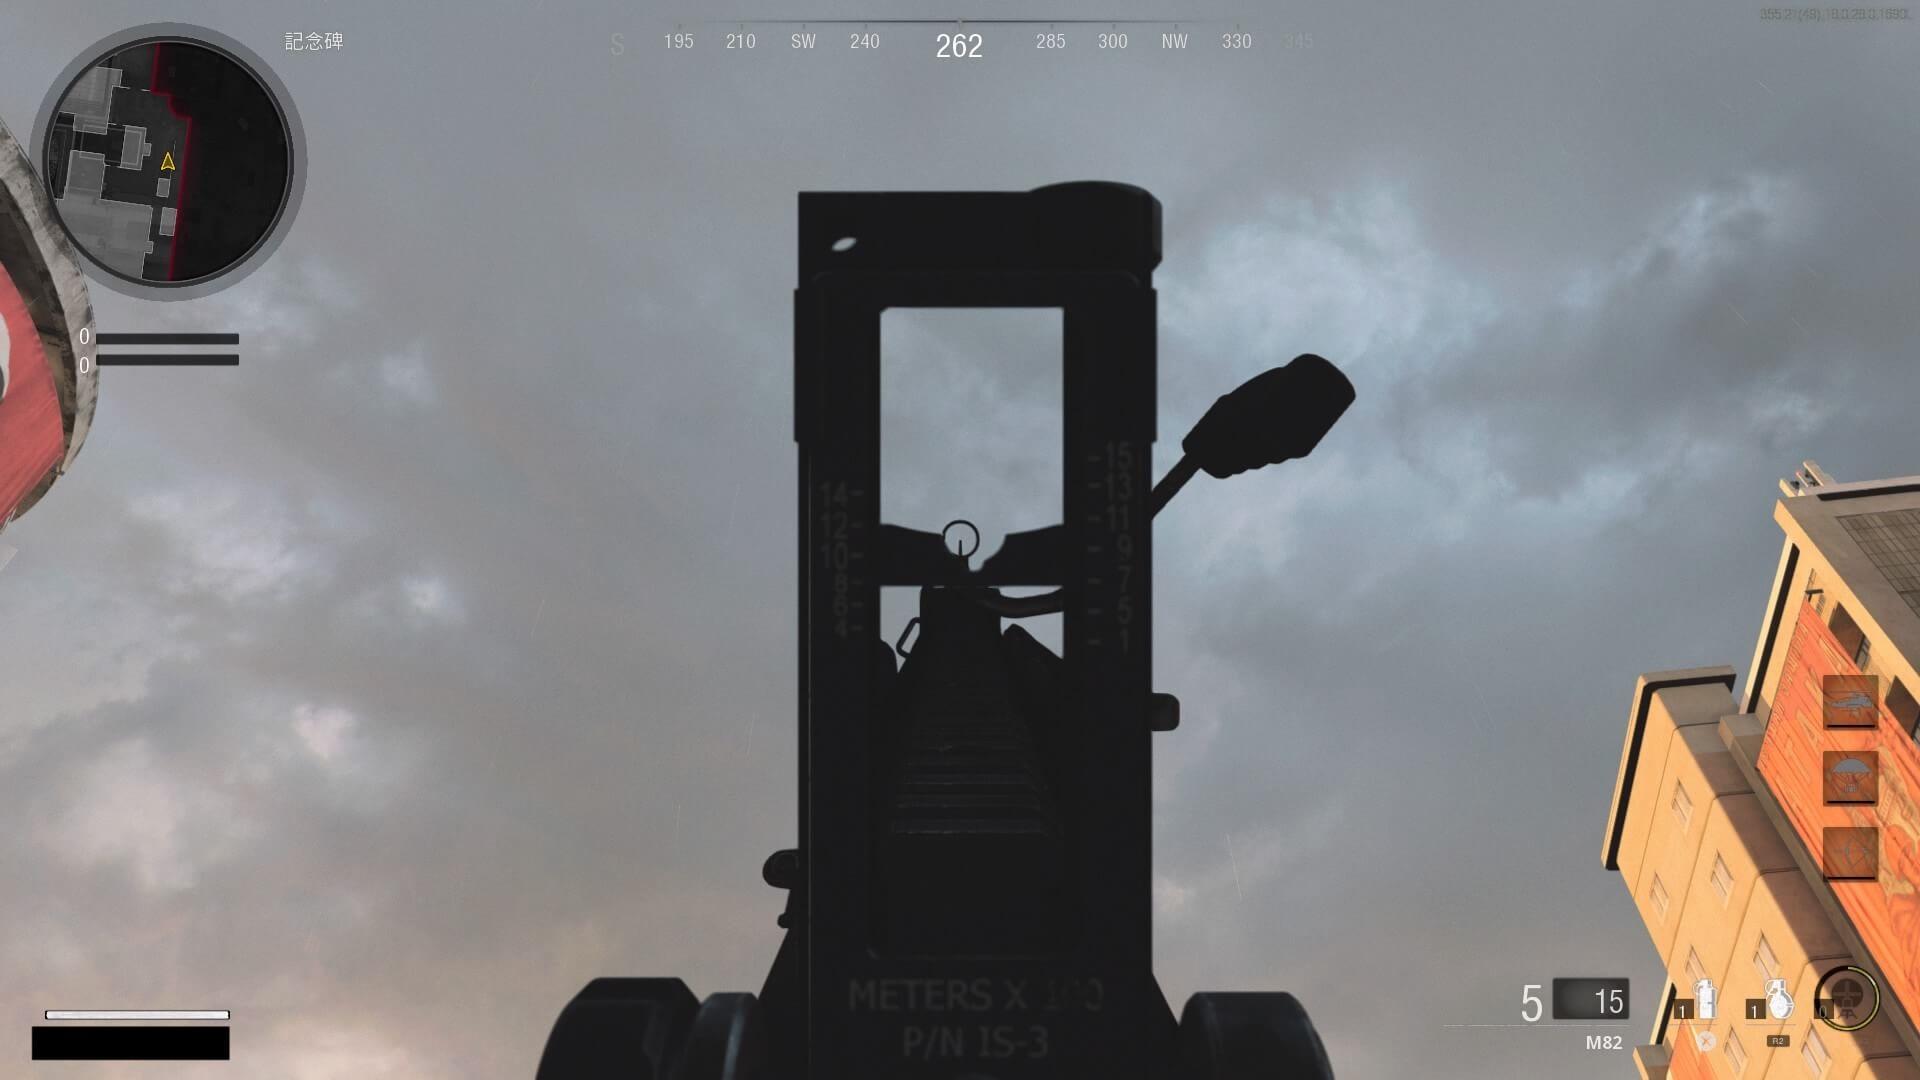 M82(アイアンサイト装着時)